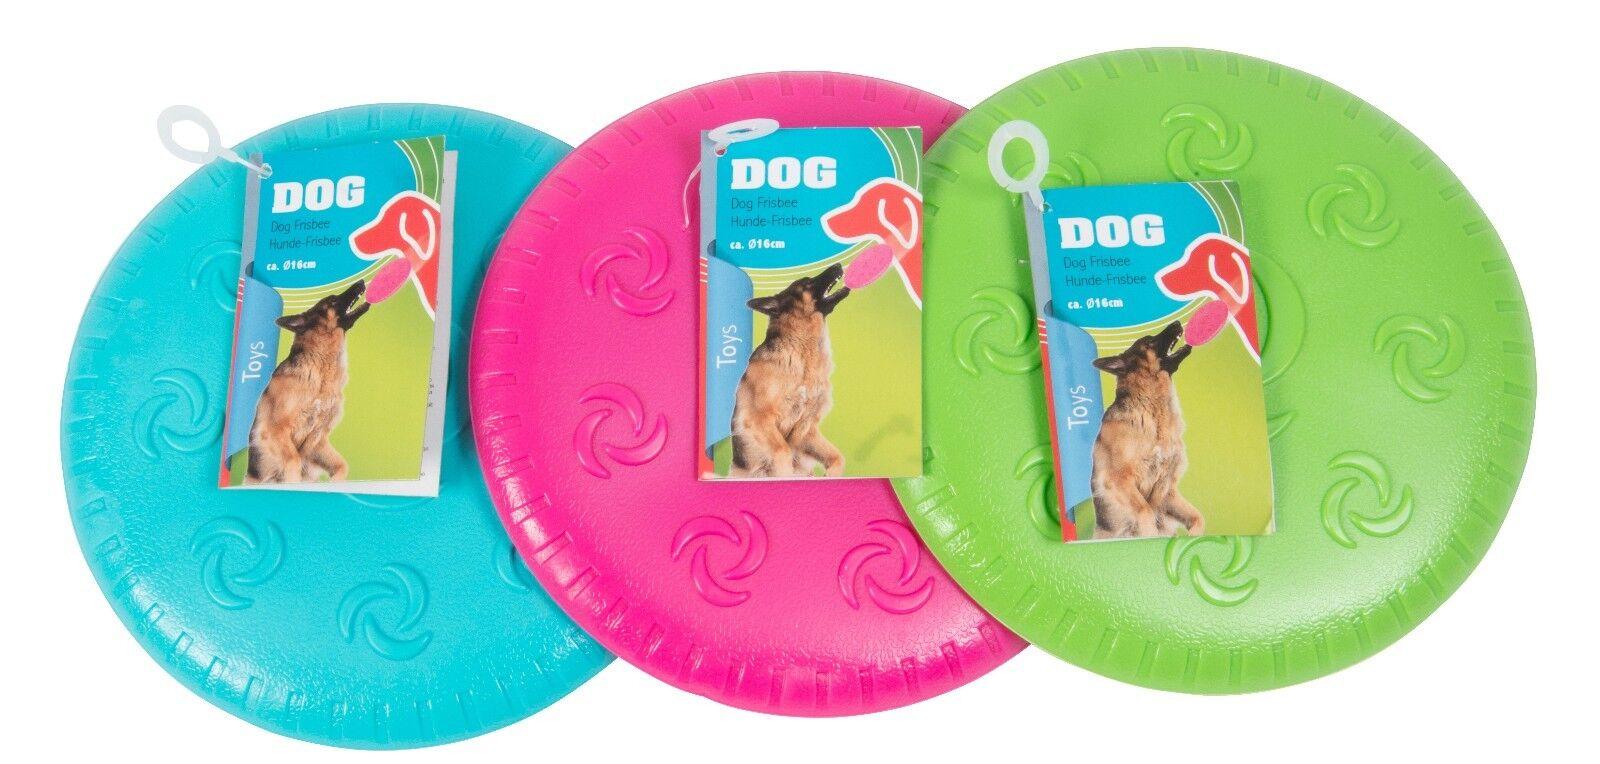 Hunde-Frisbee Hundespielzeug Frisbee Wurfscheibe 16cm Hund Spielzeug NEU